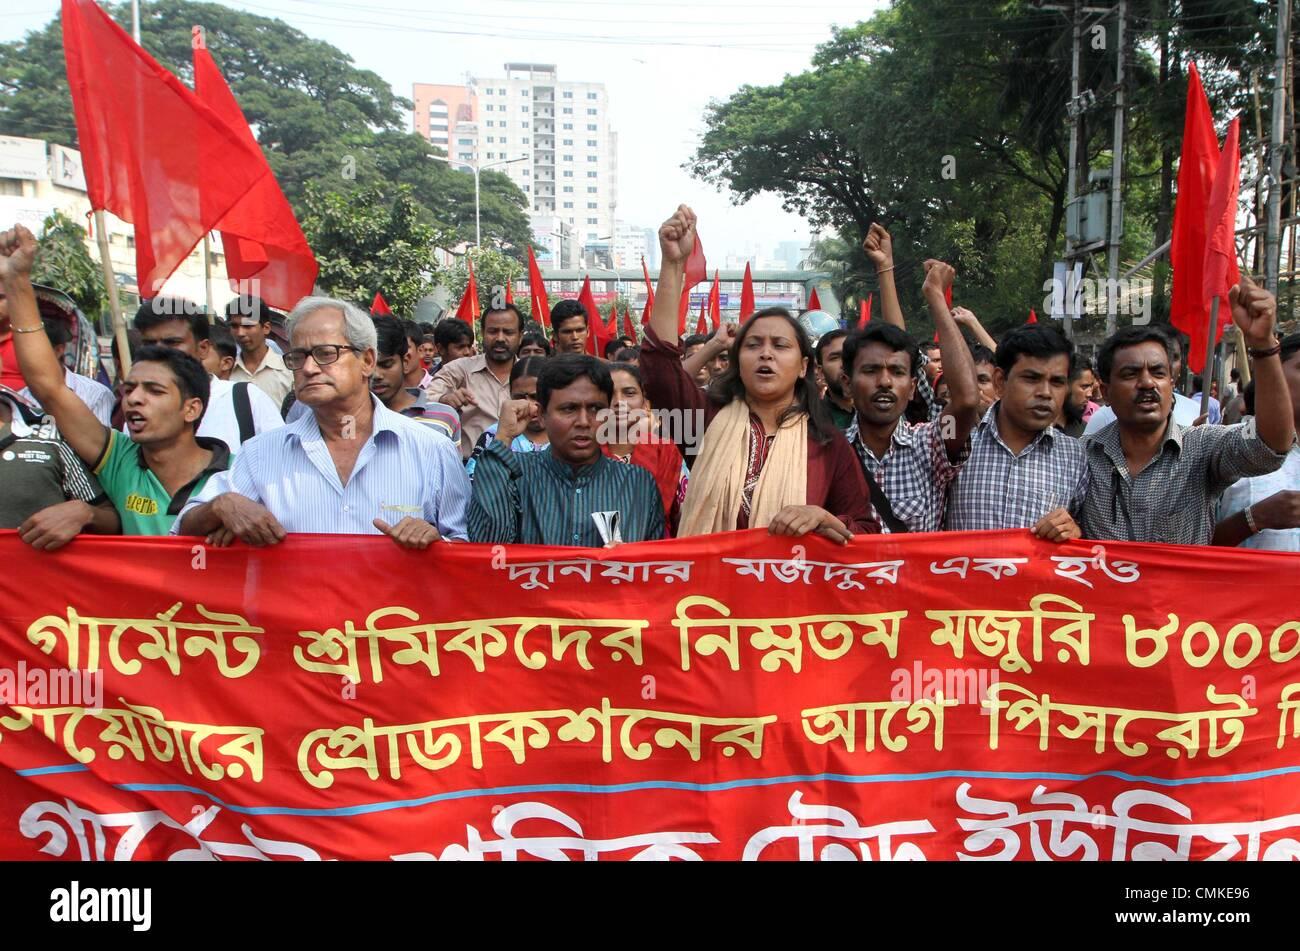 Dhaka, Bangladesh. 2nd November 2013. Bangladeshi garment workers shout slogans during a protest on wage increases - Stock Image